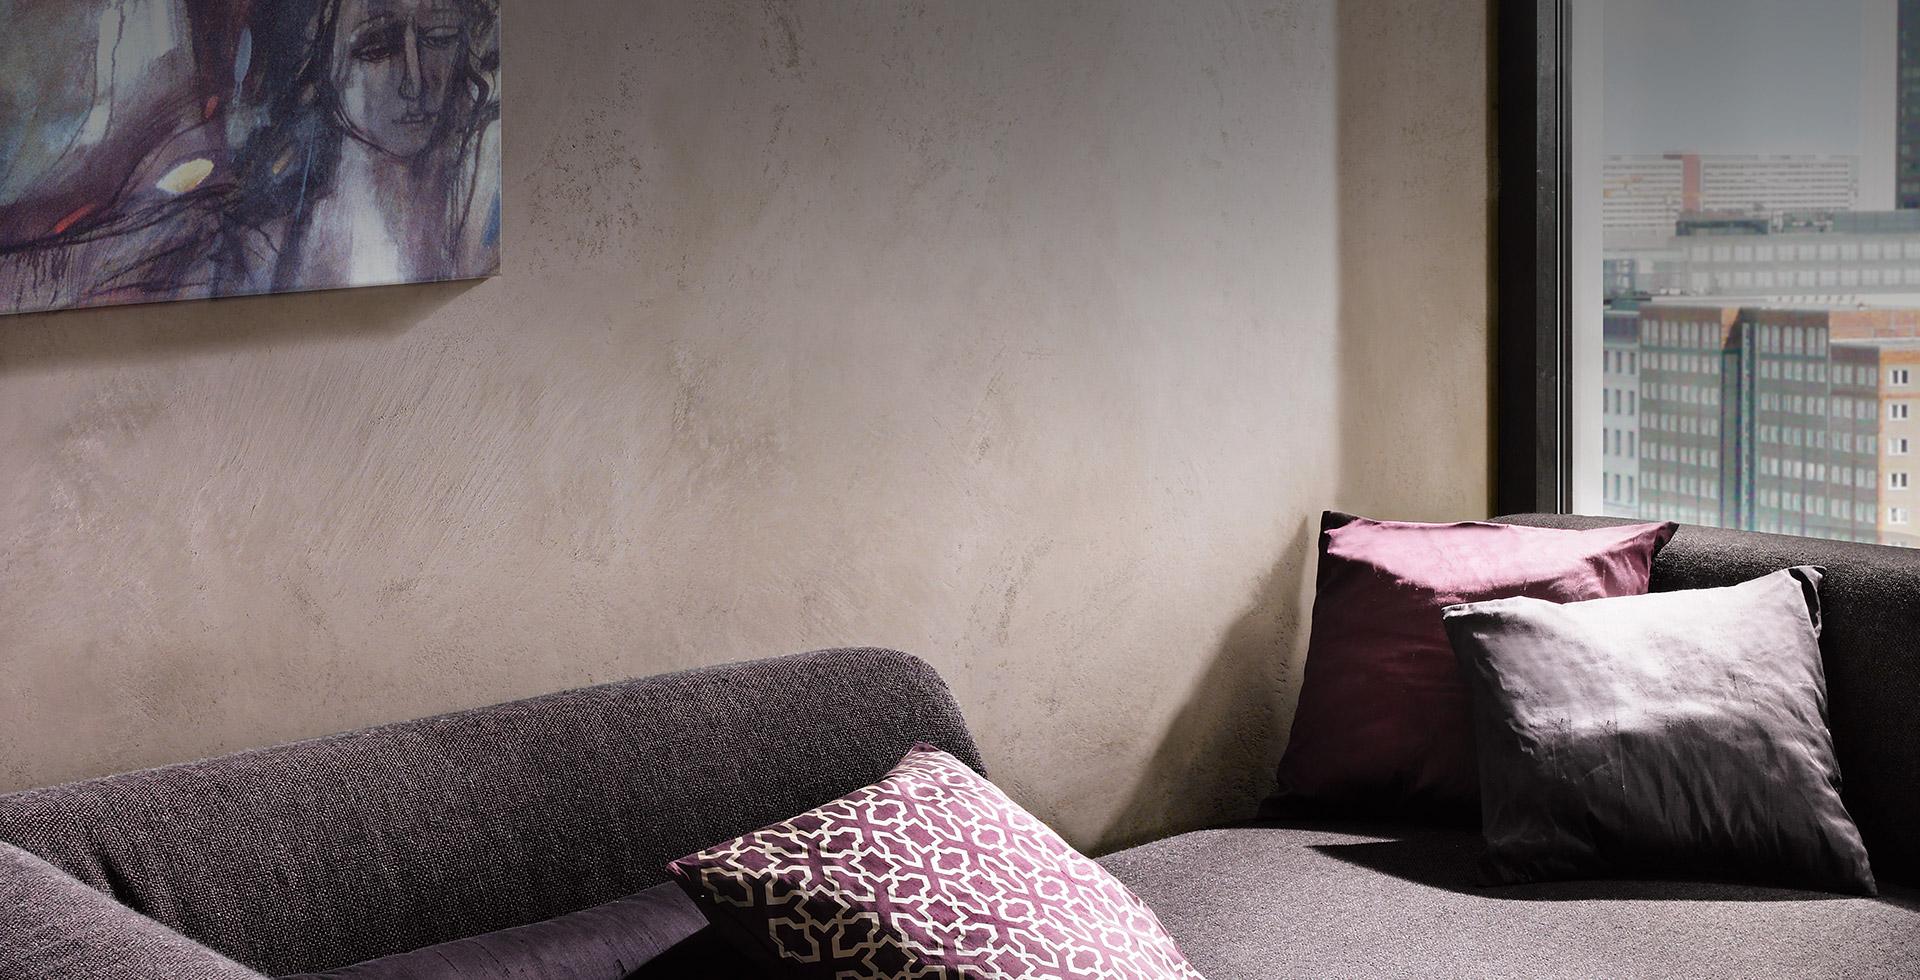 wand vision farbe struktur licht. Black Bedroom Furniture Sets. Home Design Ideas